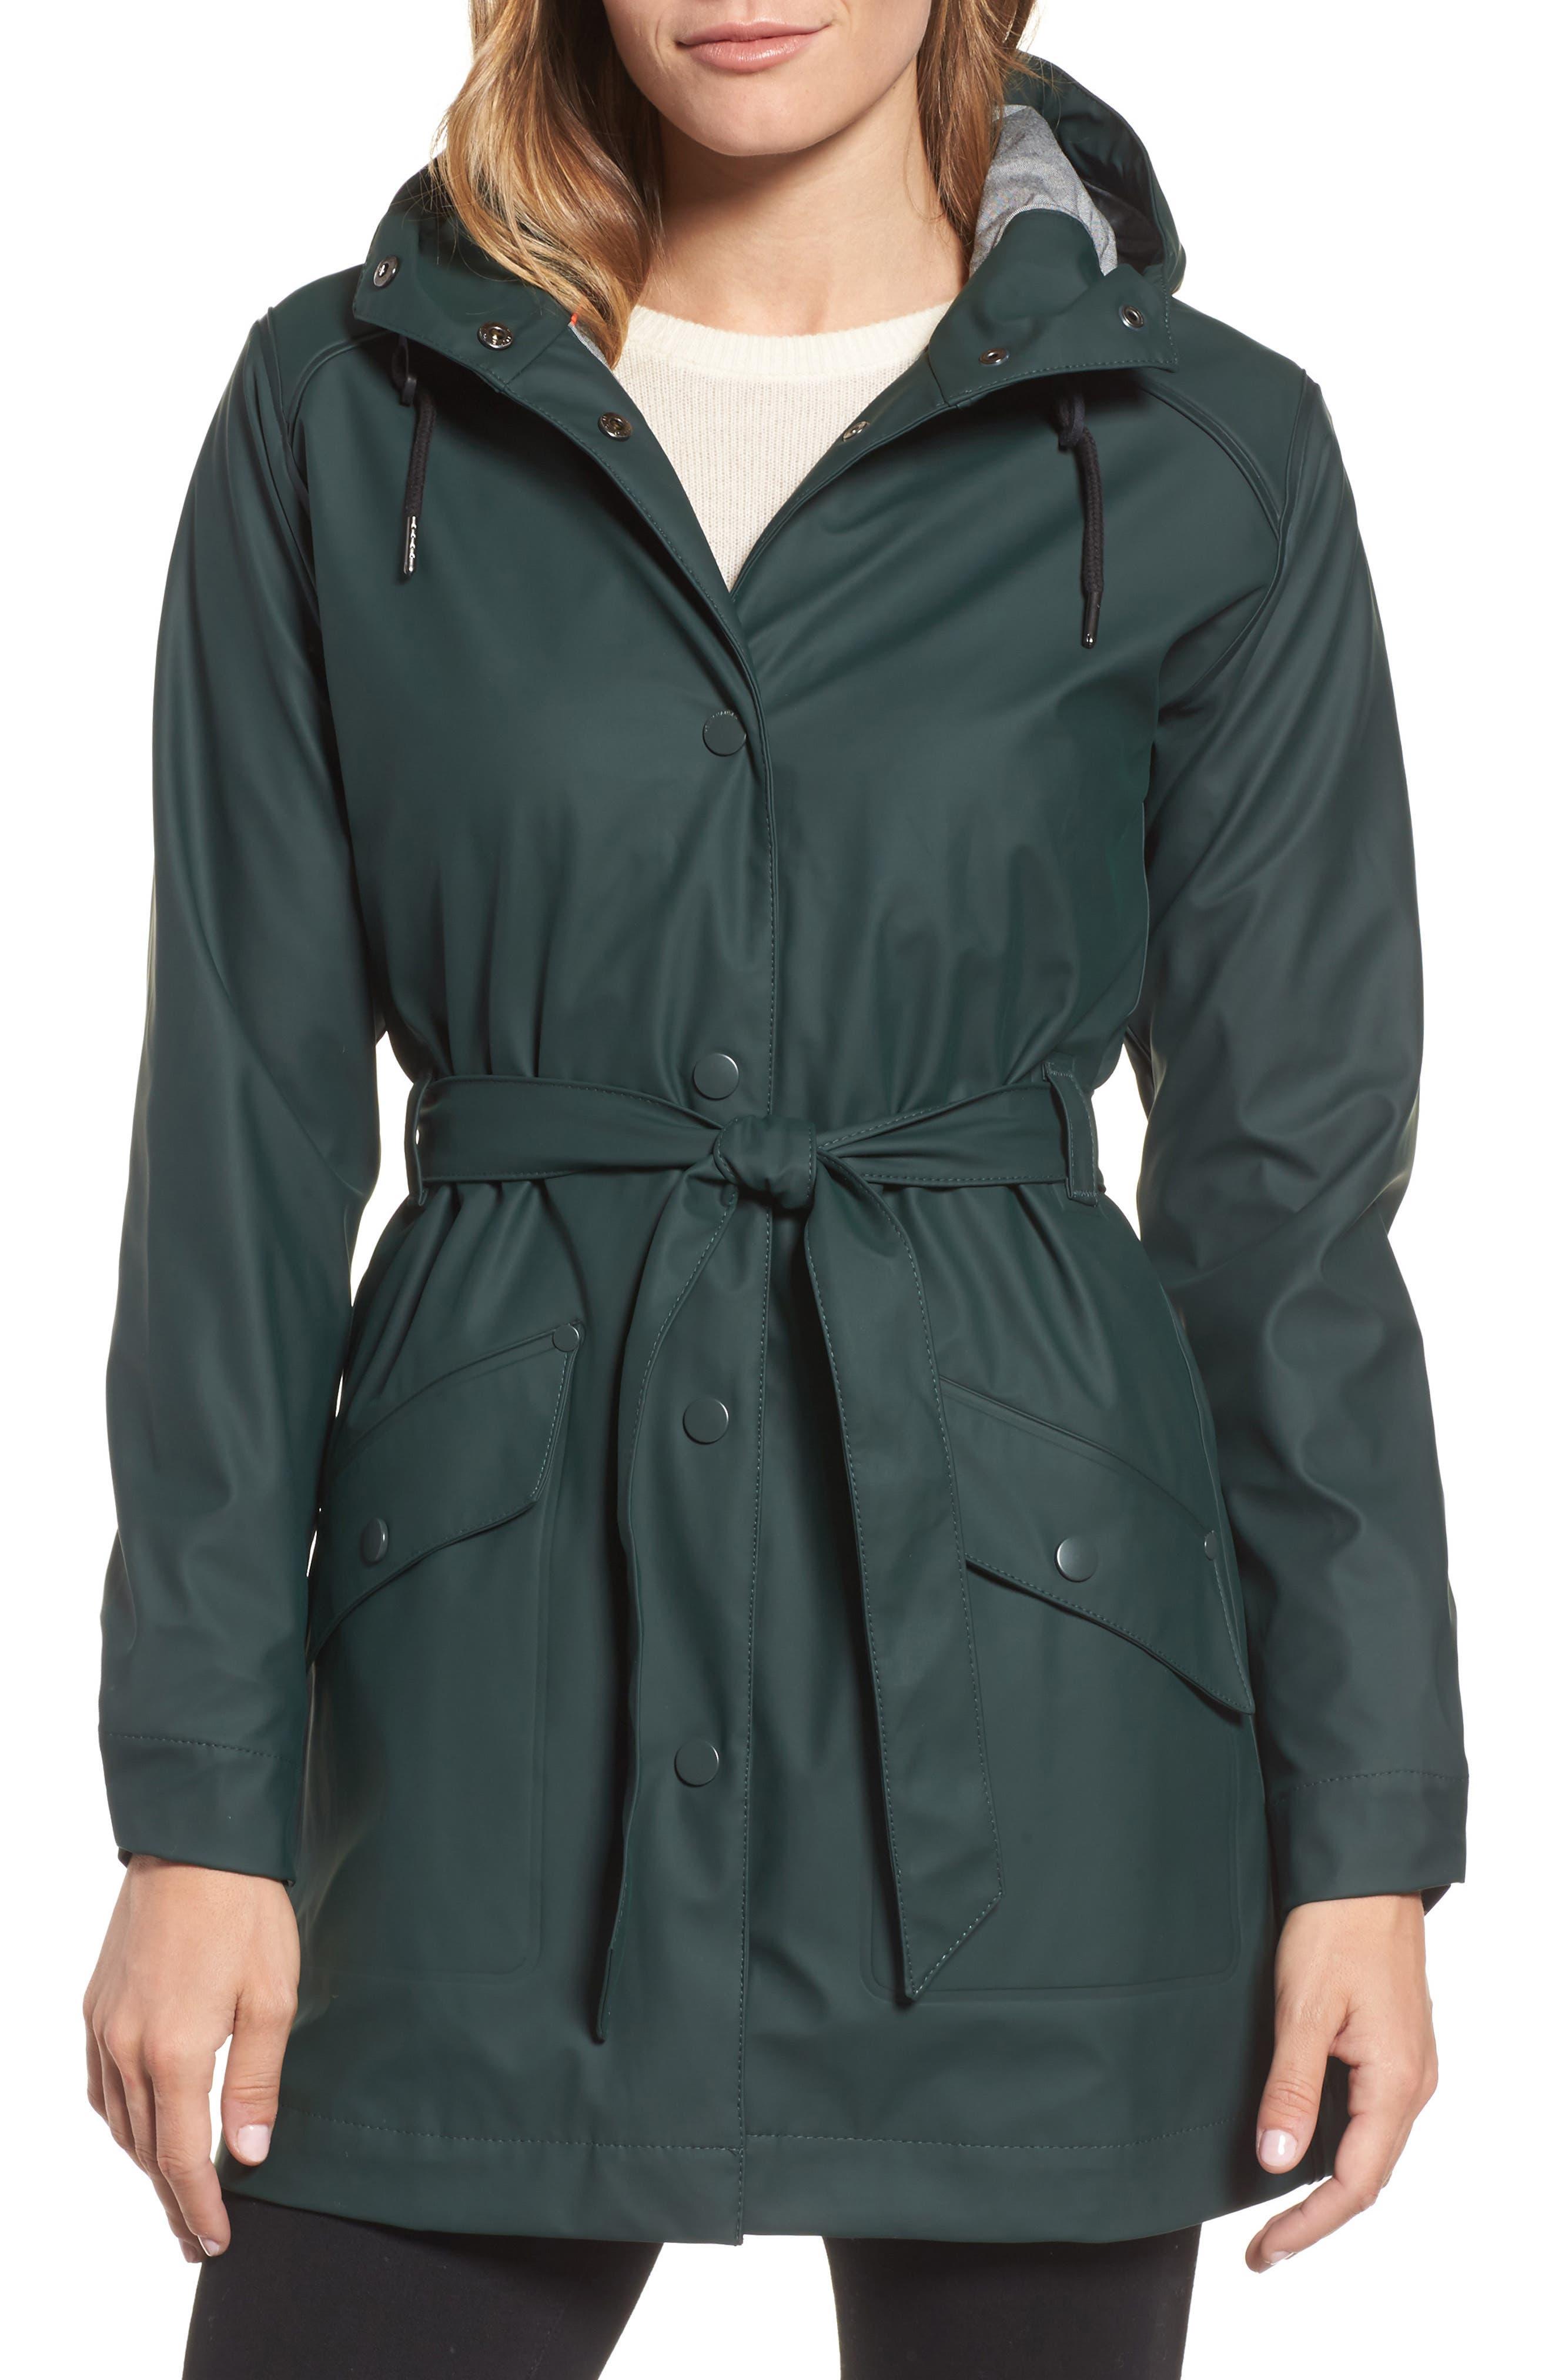 Kirkwall Raincoat,                             Main thumbnail 1, color,                             Darkest Spruce